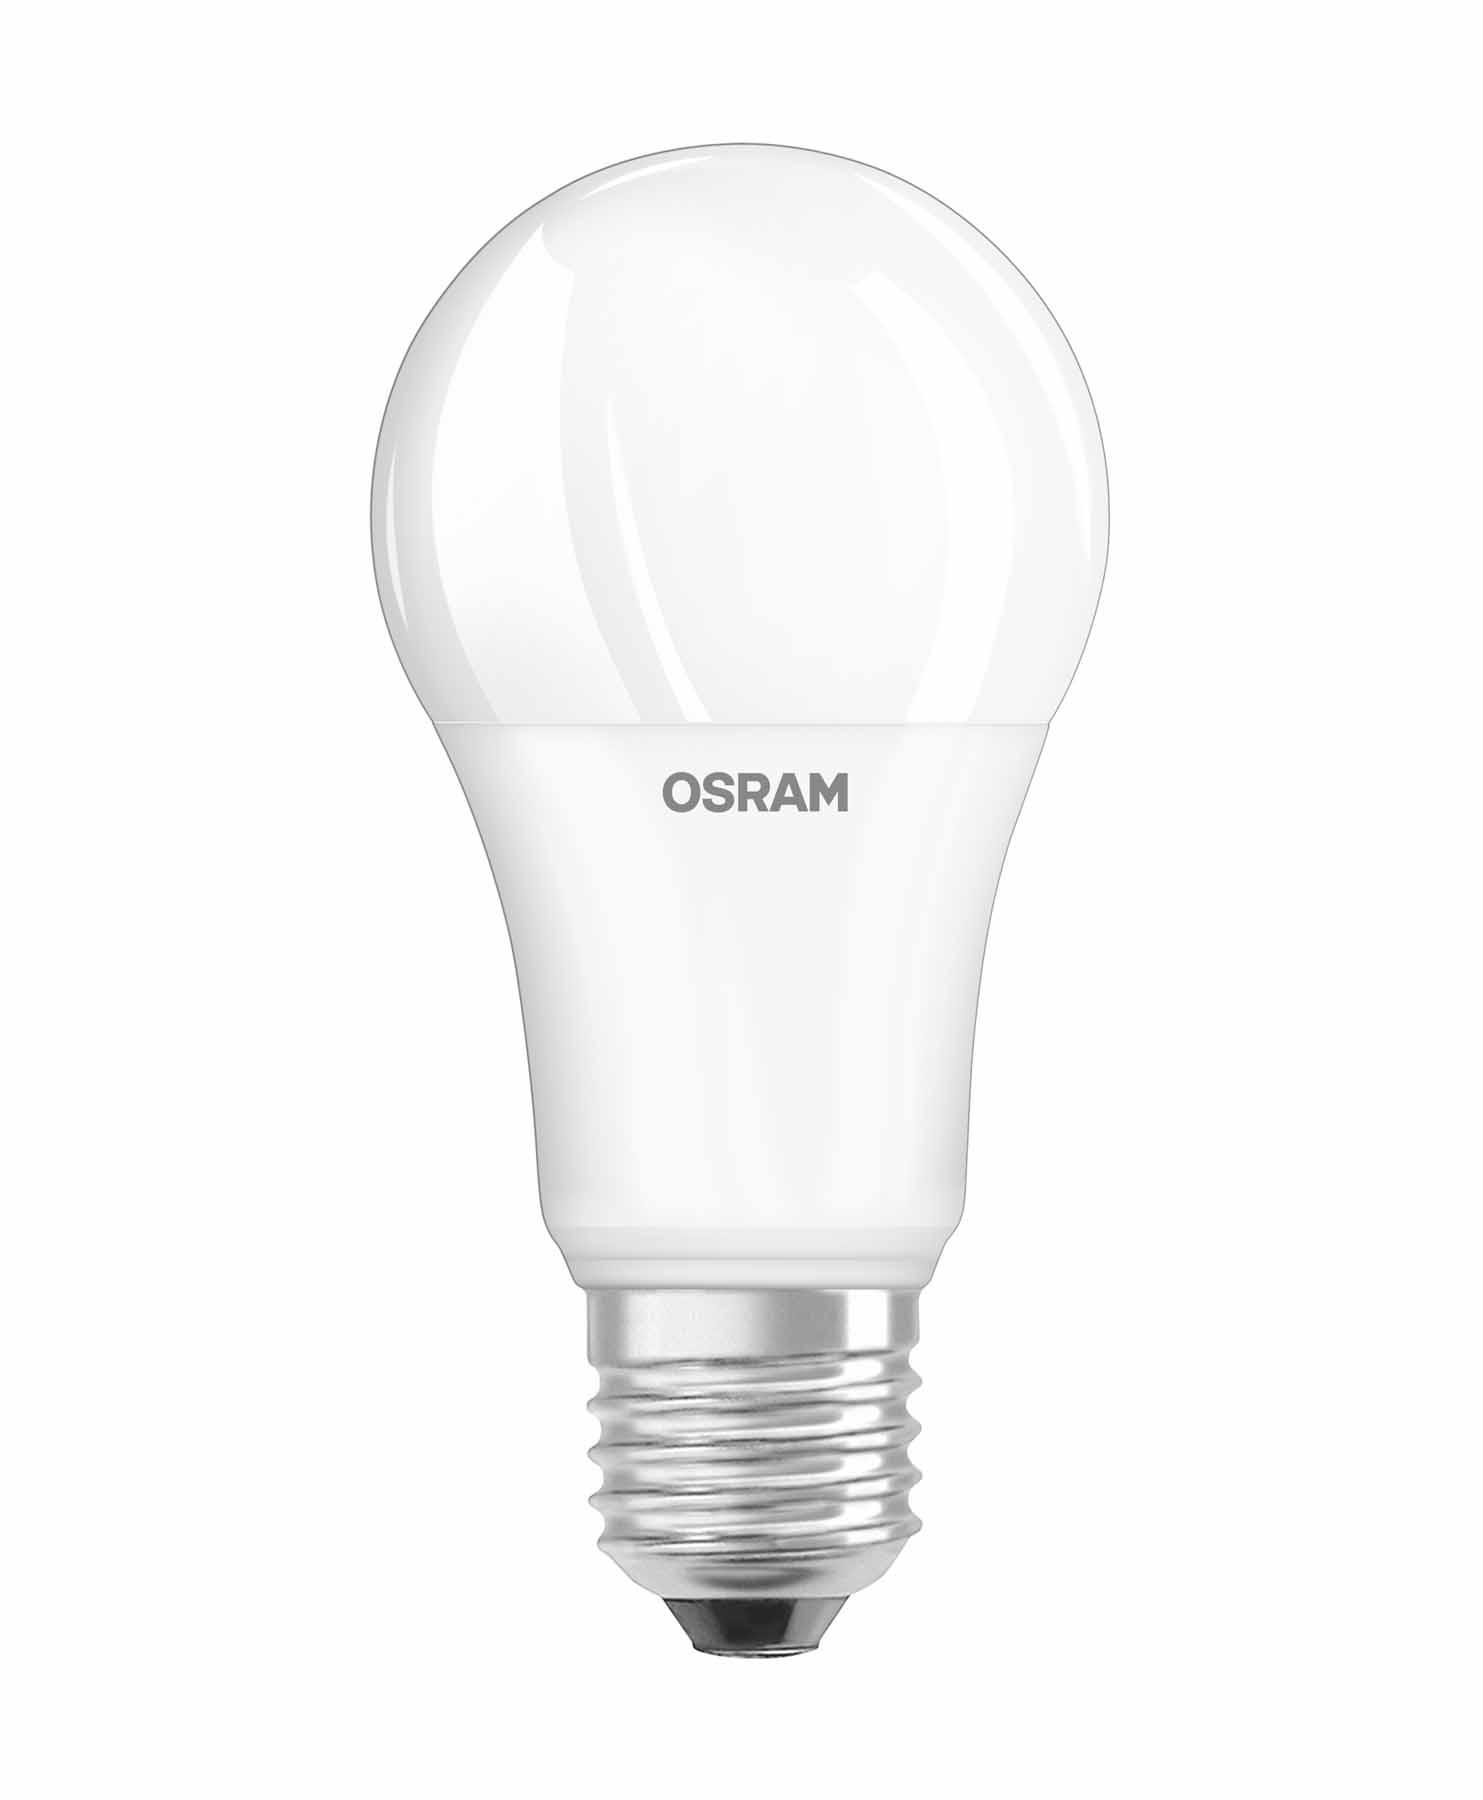 osram led star classic a 100 e27 13w wie 100 watt 1522. Black Bedroom Furniture Sets. Home Design Ideas